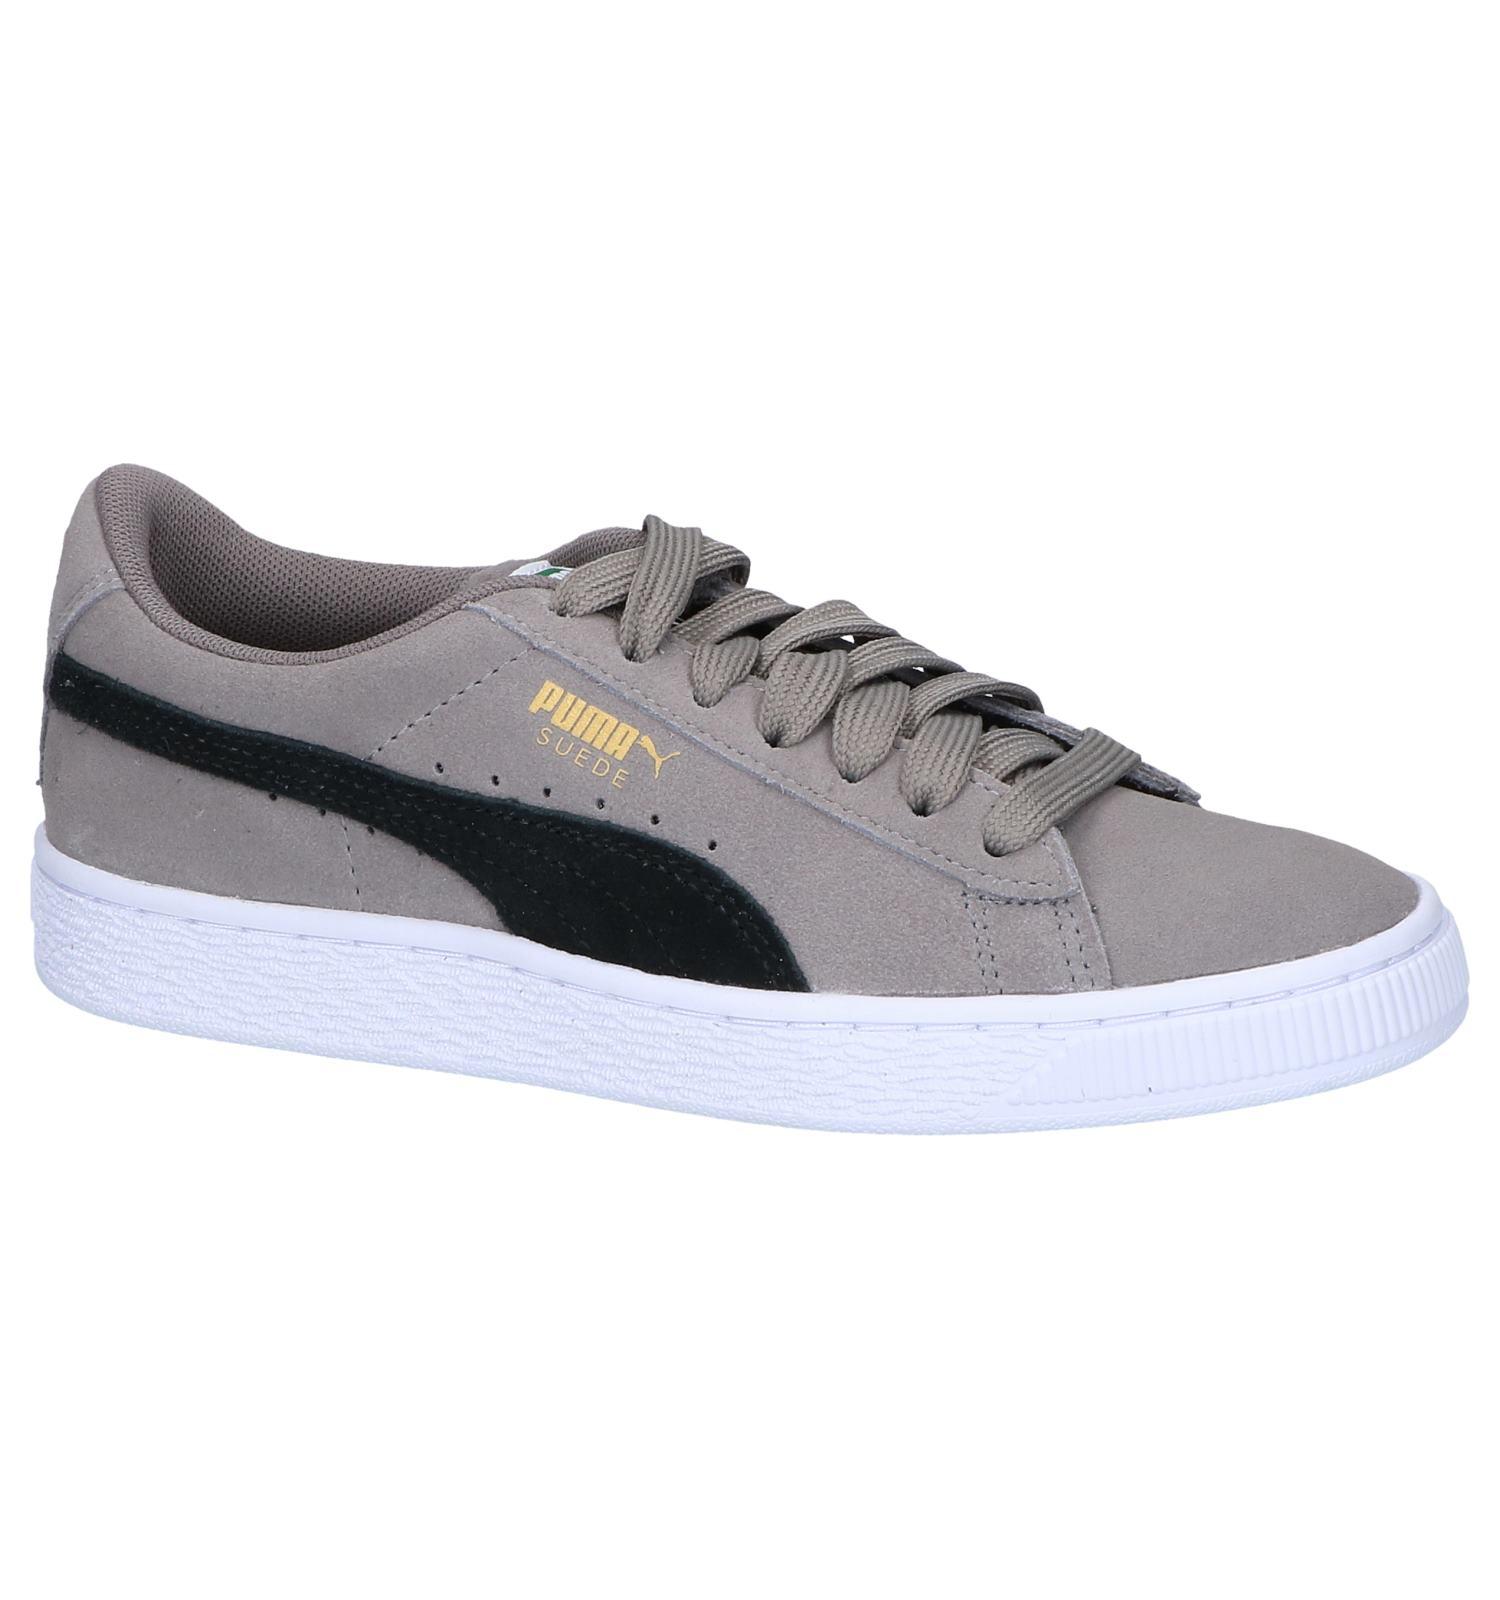 a9b4f4b9e77 Grijze Sneakers Puma Suede Classic | SCHOENENTORFS.NL | Gratis verzend en  retour